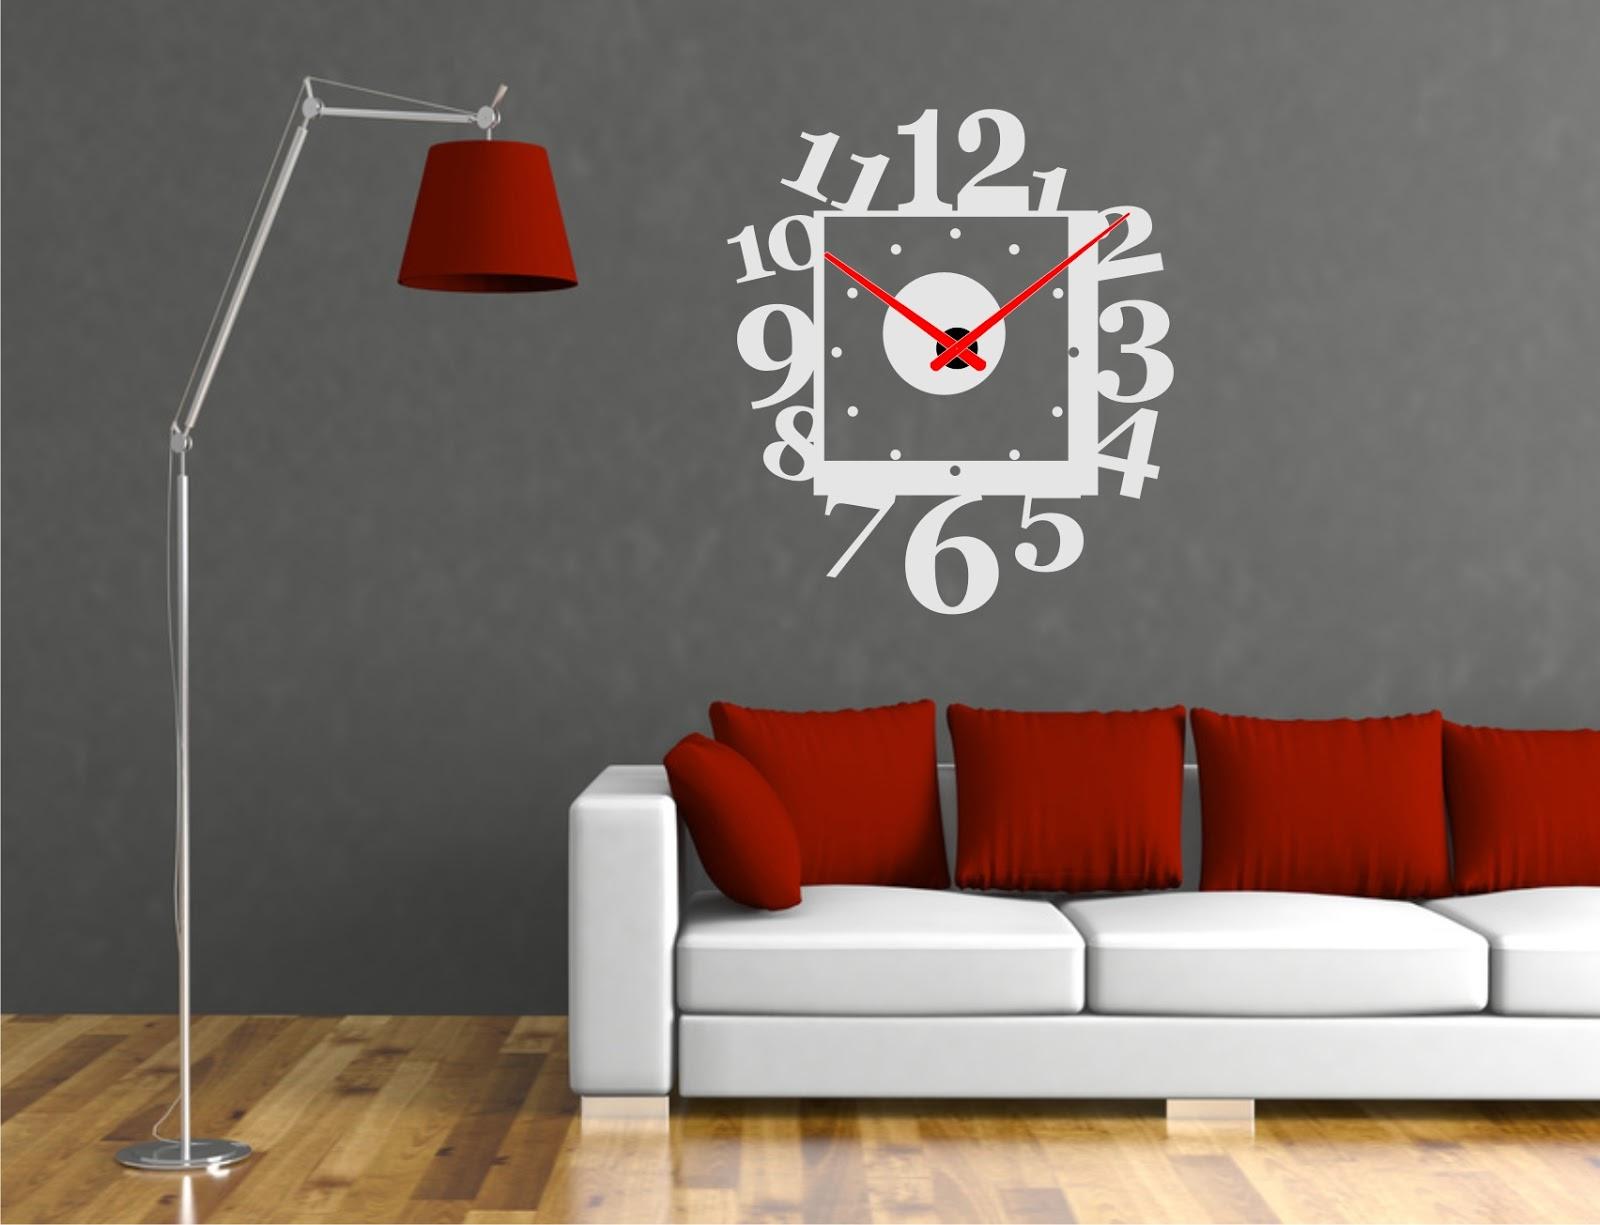 ec49dd871e93 Relojes de Pared Modernos Muebles lluesma - Relojes De Diseño De Pared